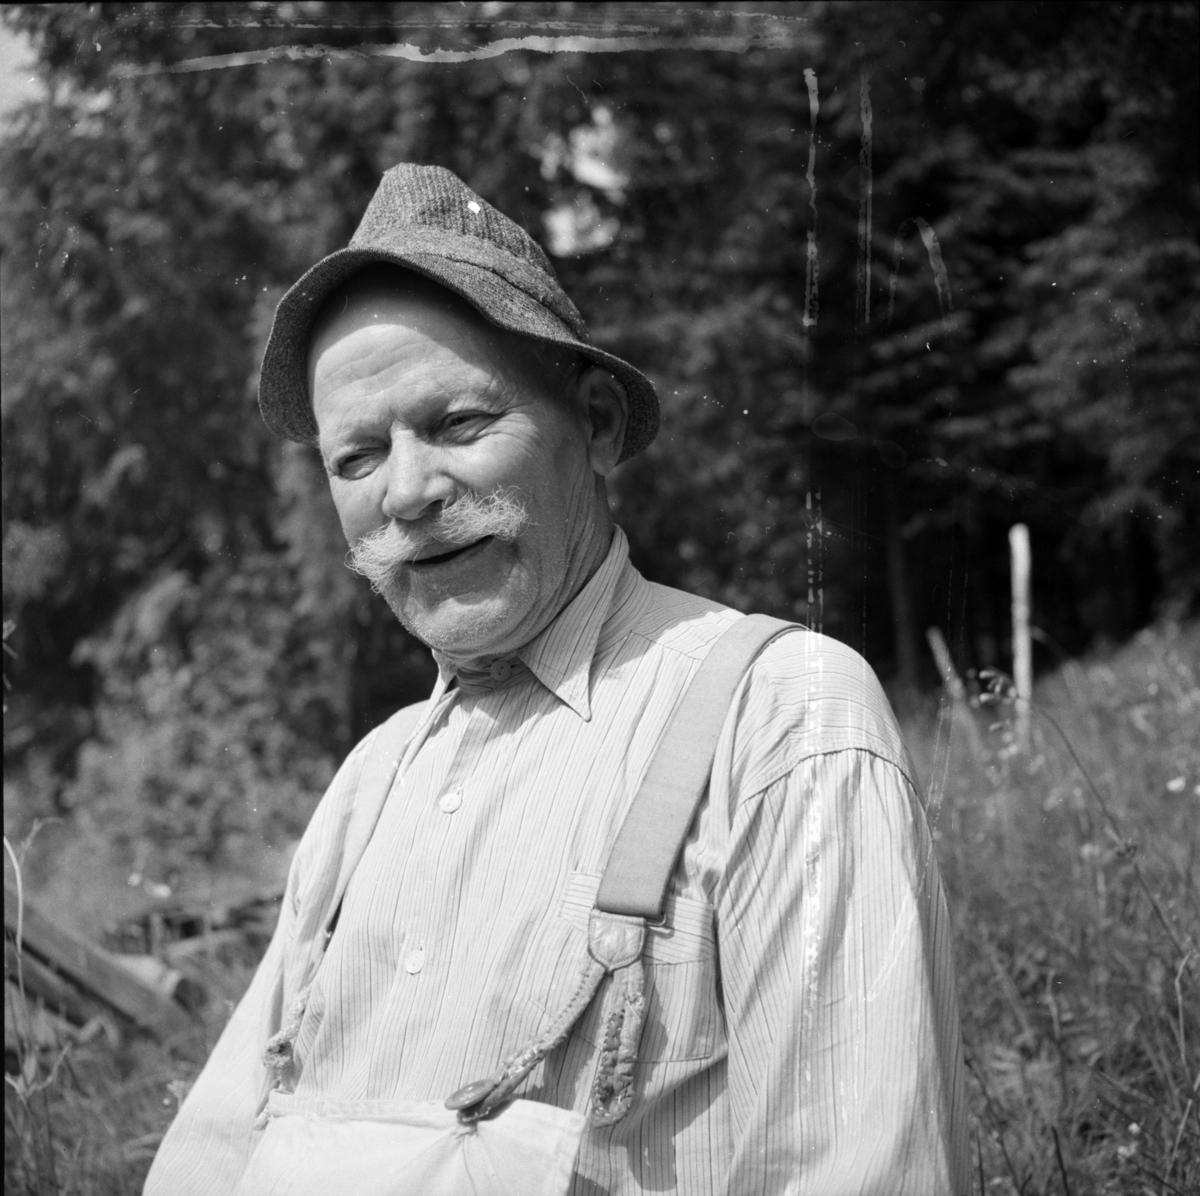 Nitahå-Jussi